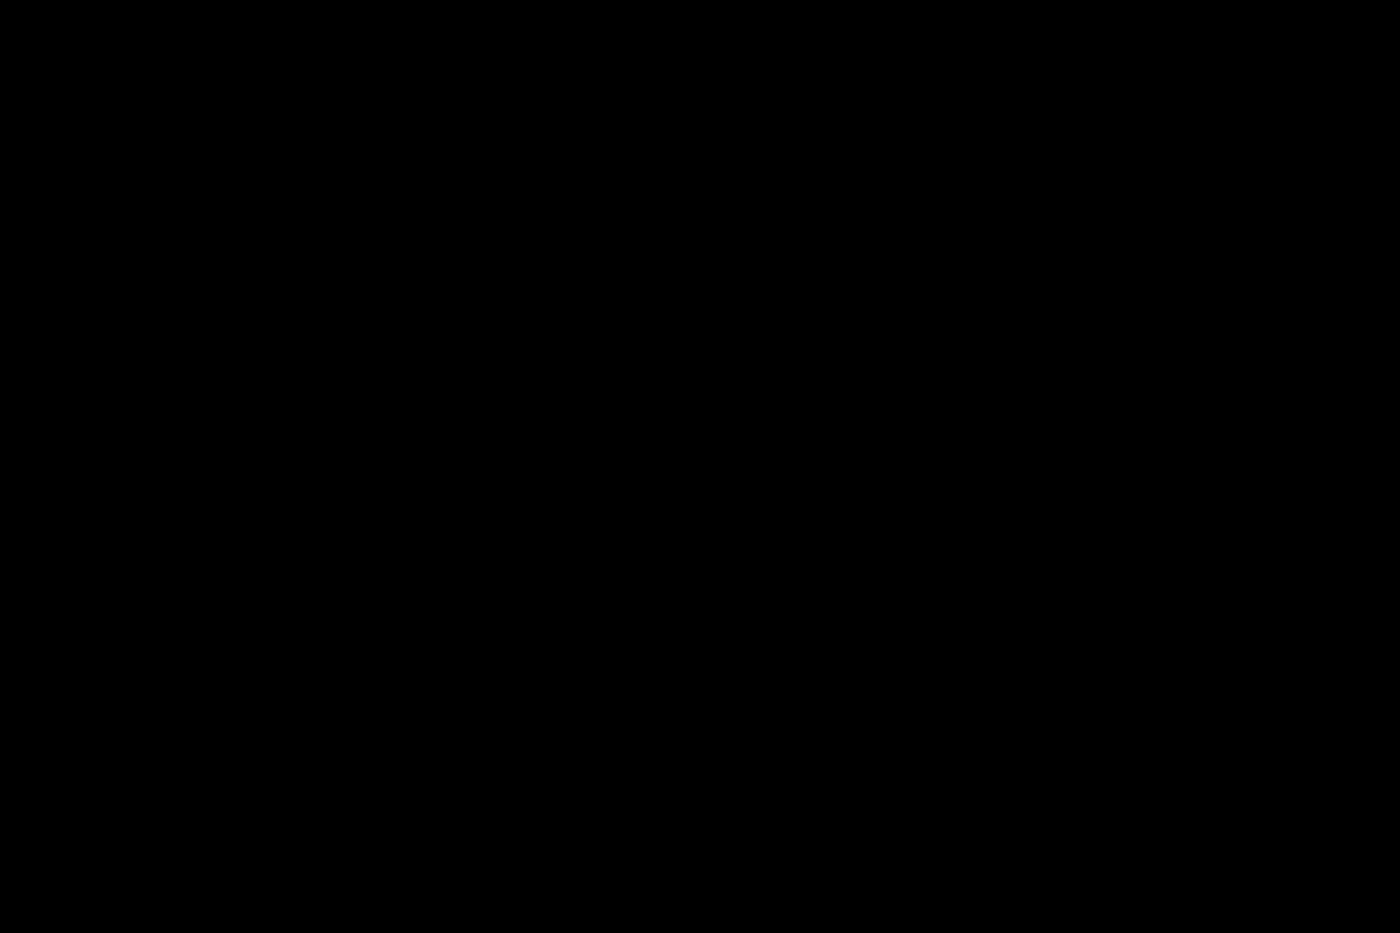 txt_2062_enbw_jp_bilsterberg_paulgaertner_web